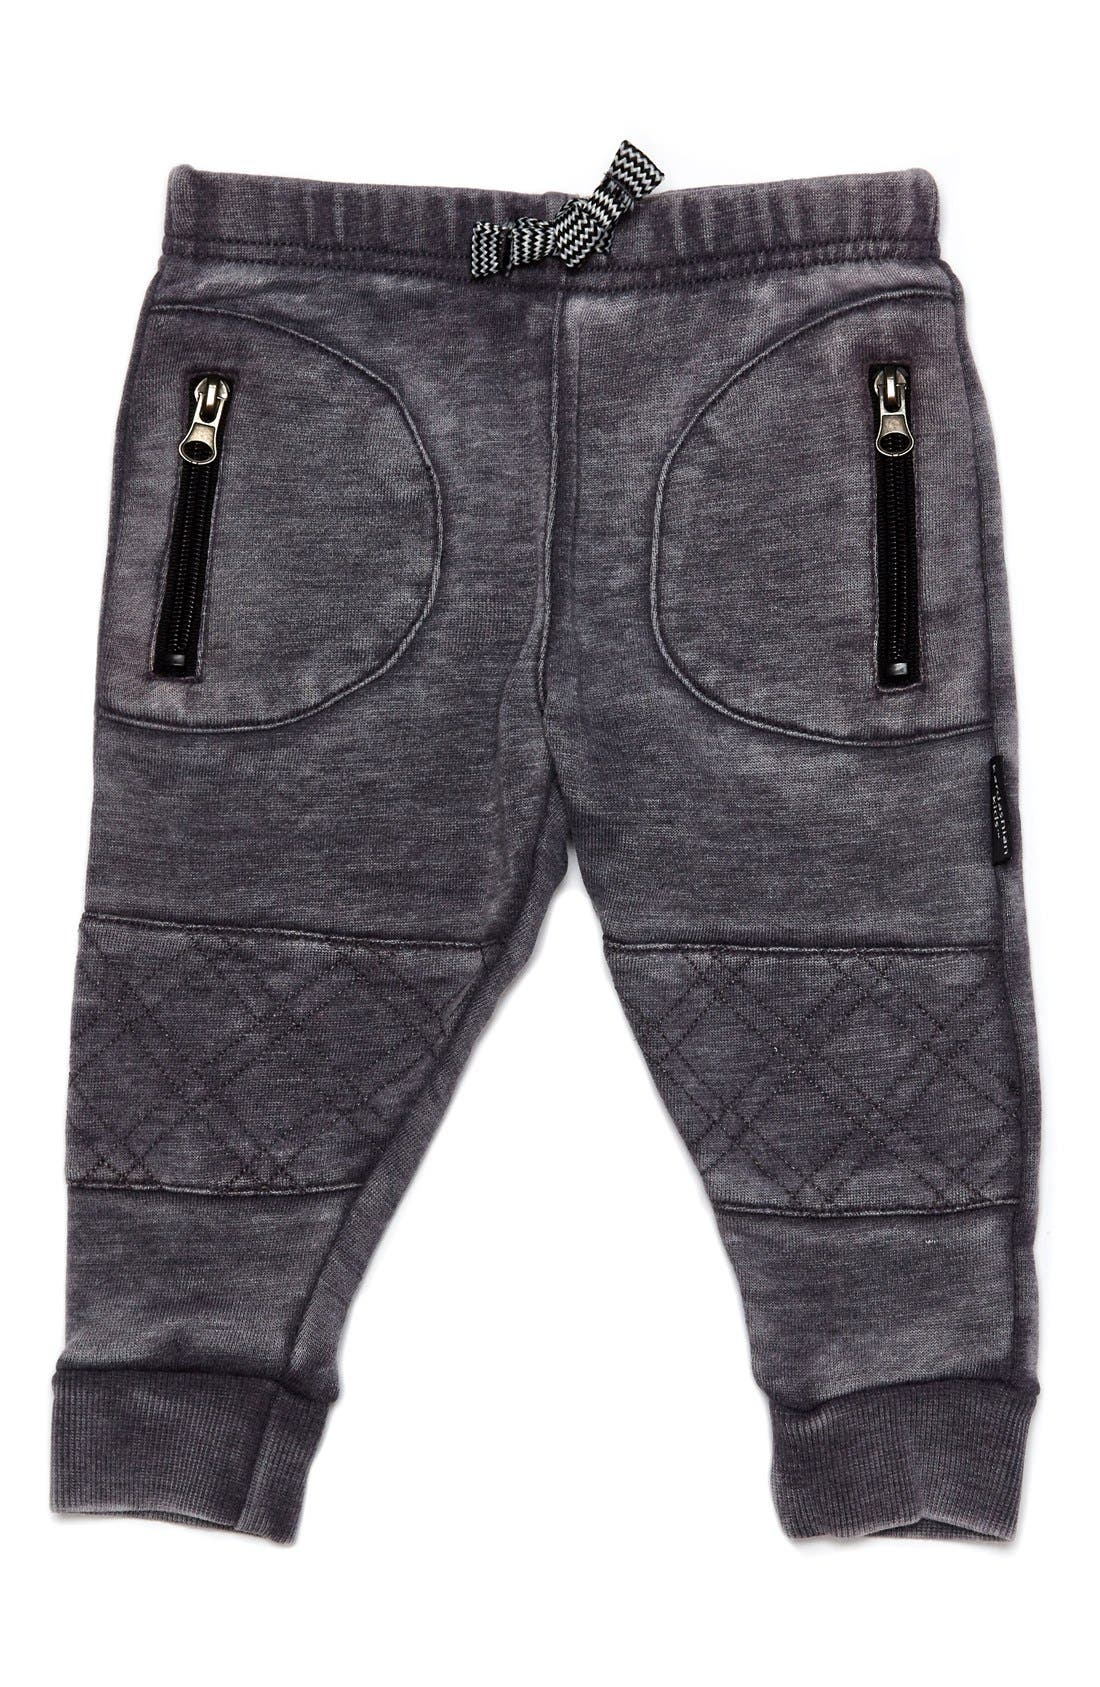 Alternate Image 1 Selected - Kardashian Kids Quilted Jogger Pants (Toddler Boys & Little Boys)